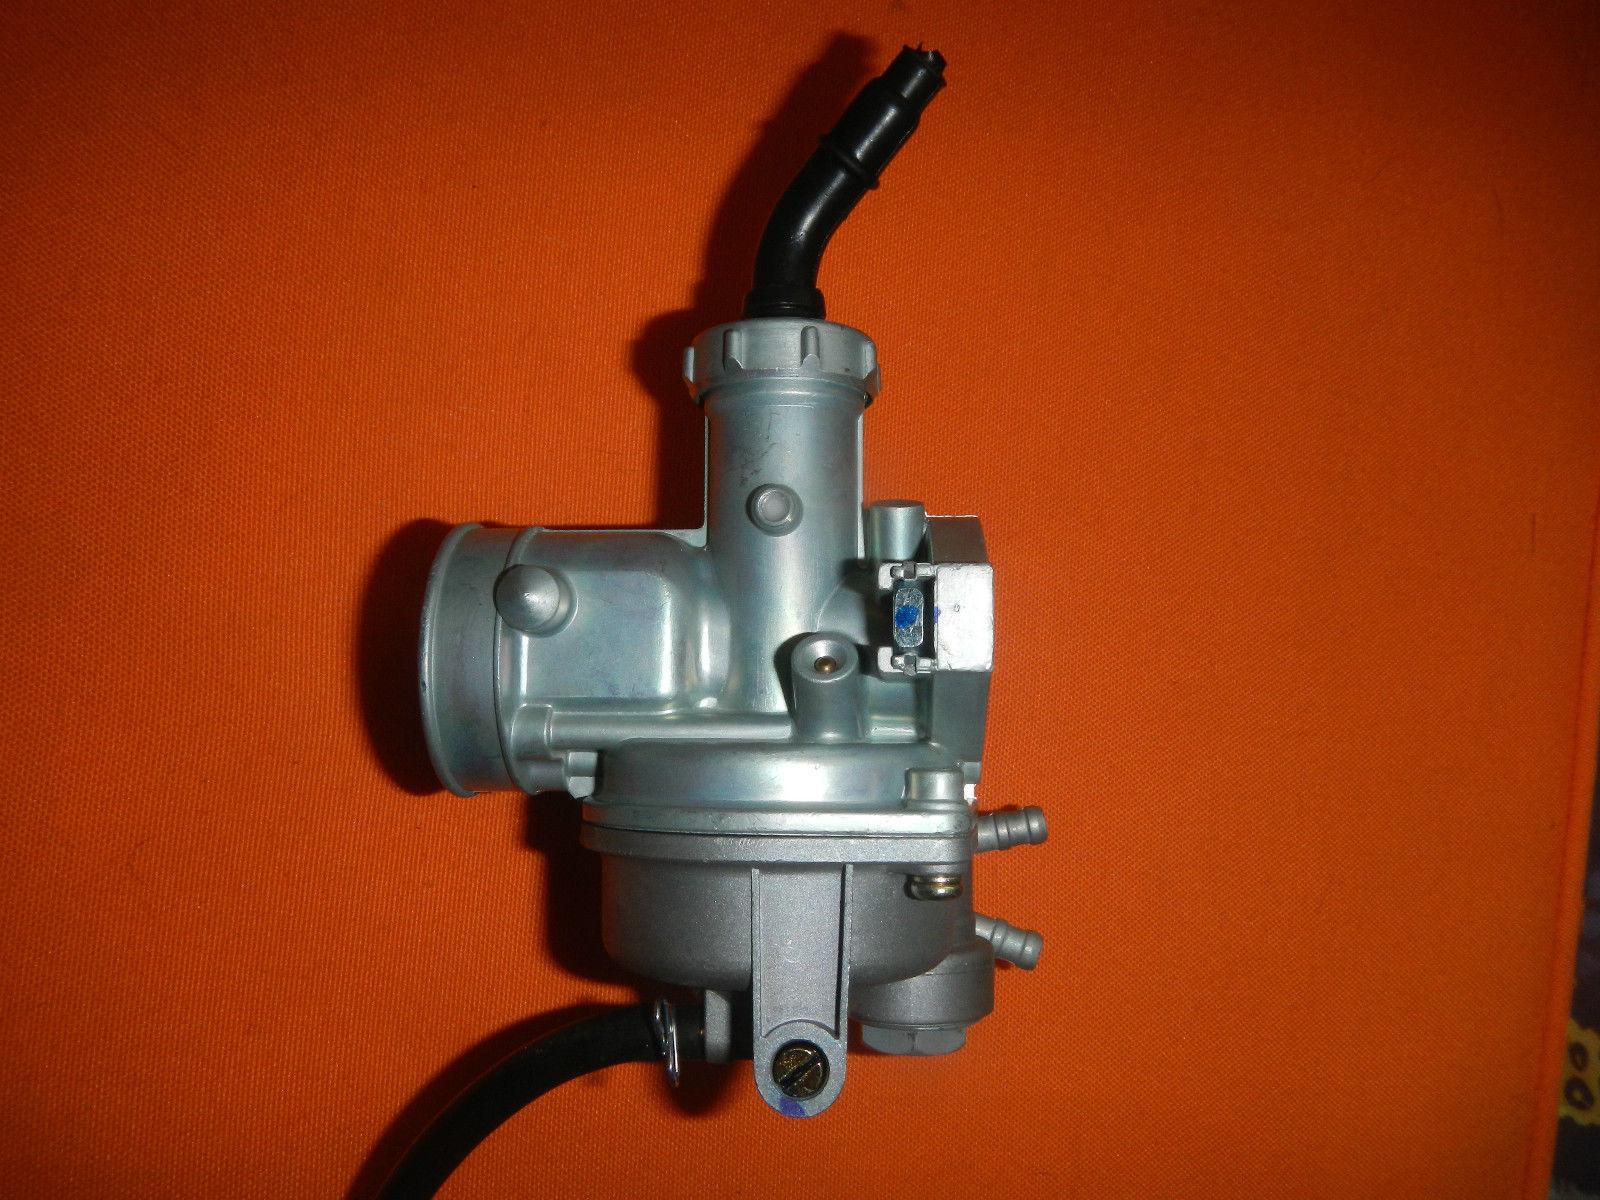 New Aftermarket Carburetor 1979-1985 Honda and 50 similar items